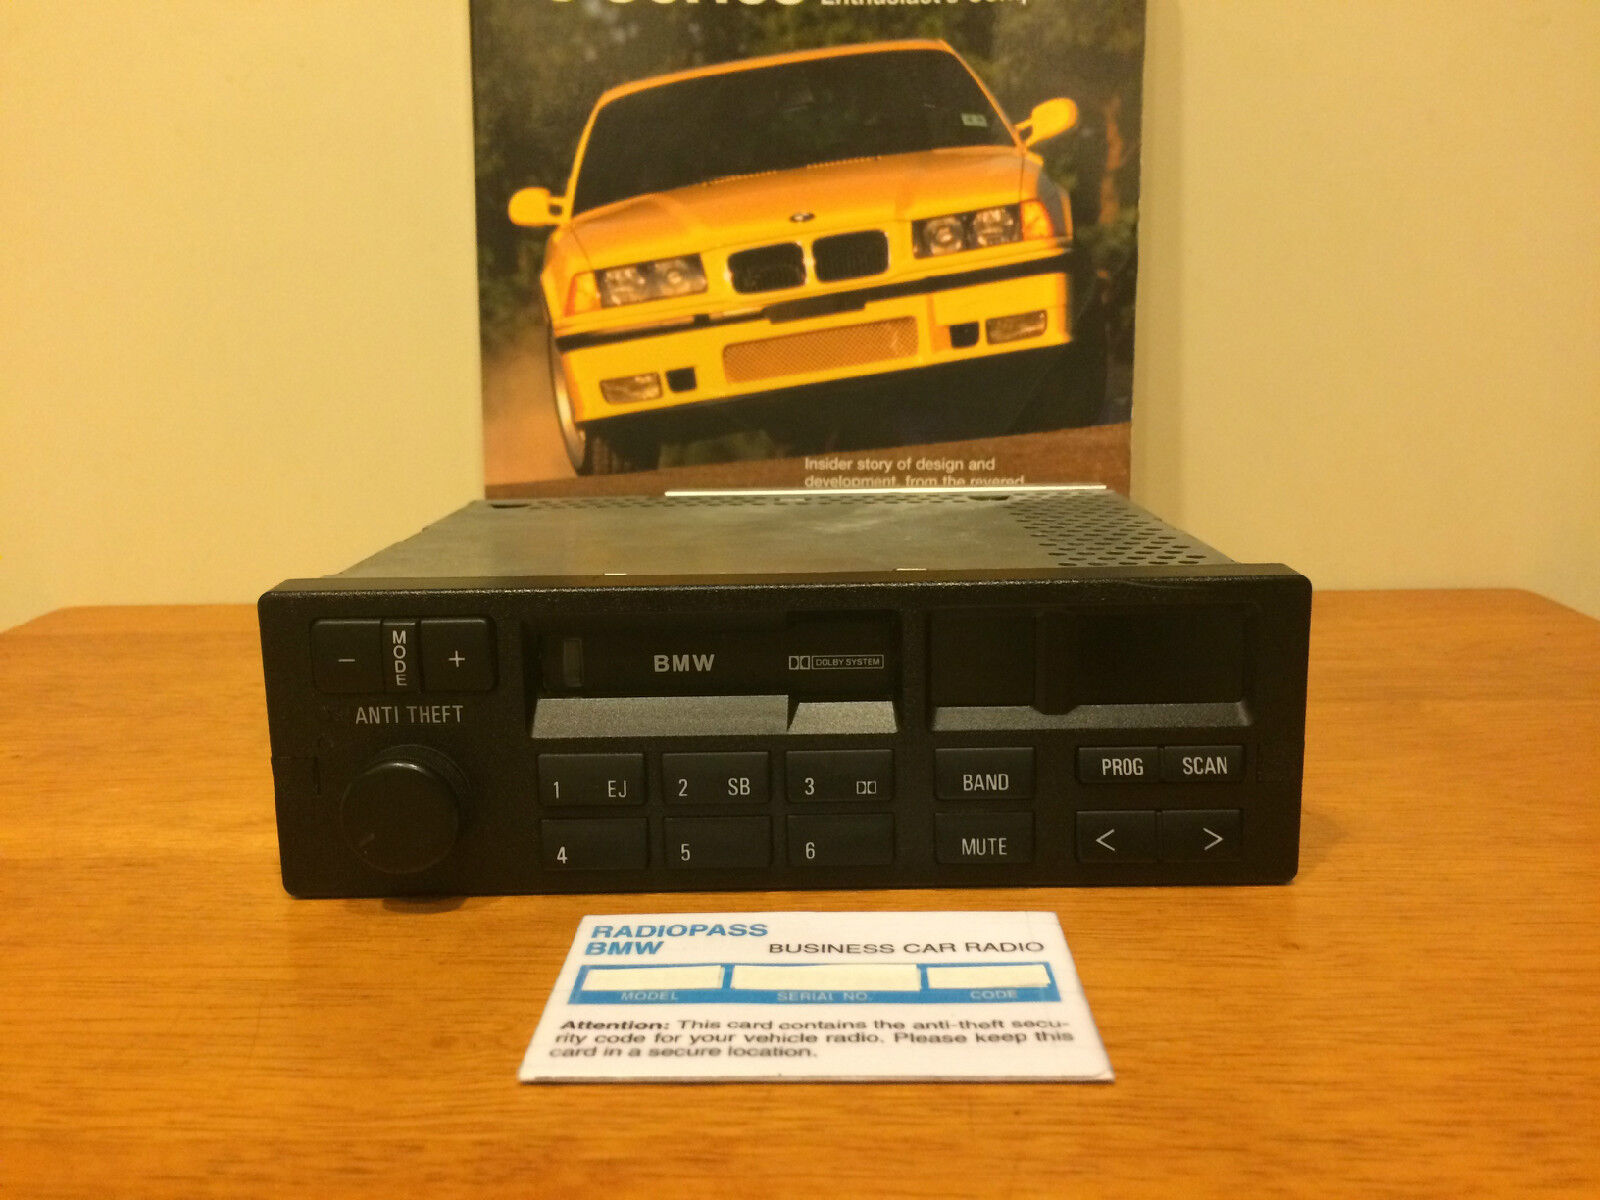 BMW CM5903L RADIO STEREO E31 E32 E34 E36 318 325 M3 M5 525